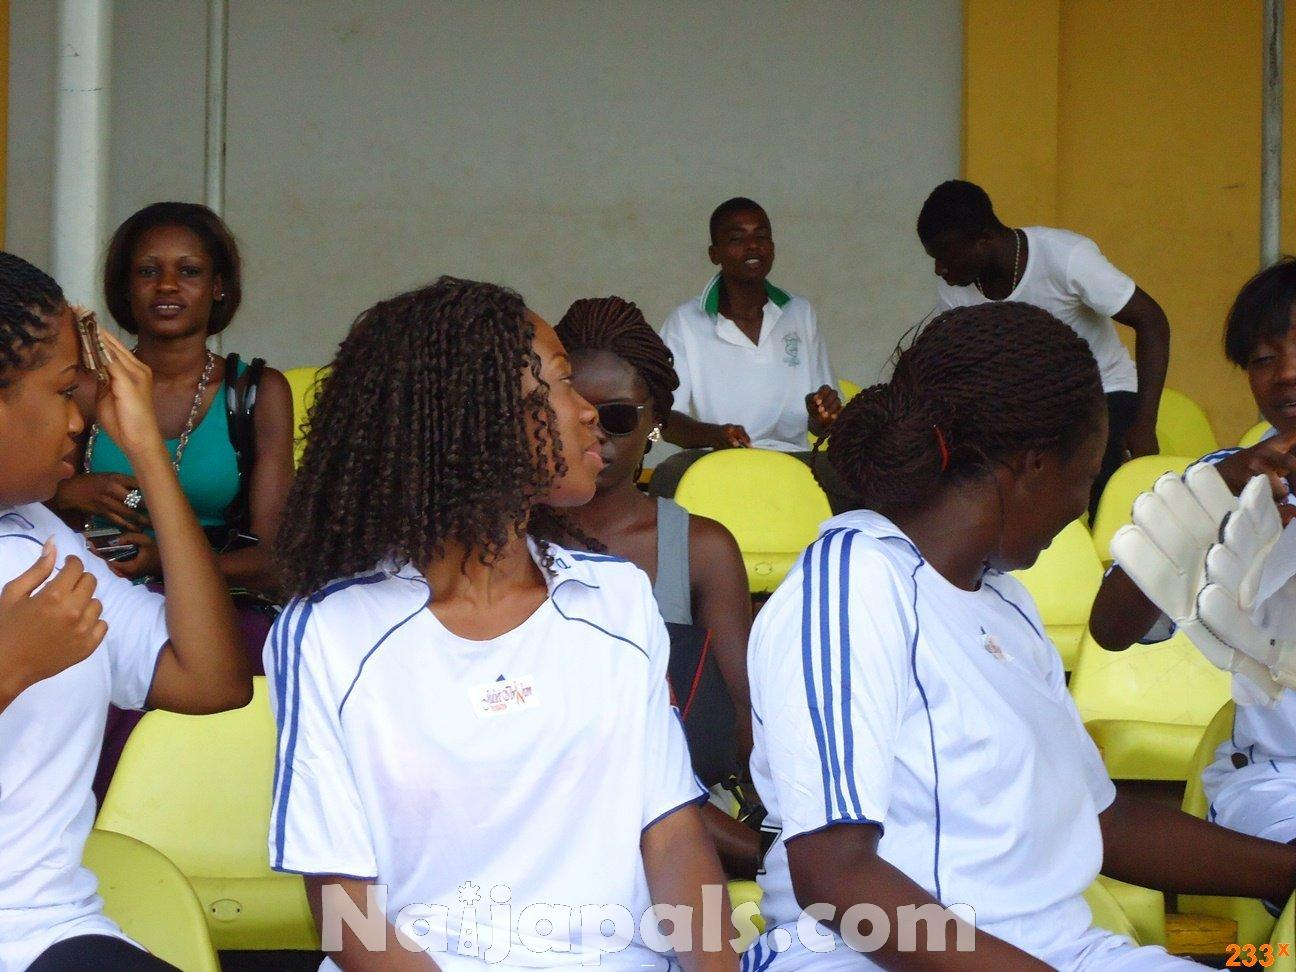 Ghana Female Celebrities Soccer Match 127